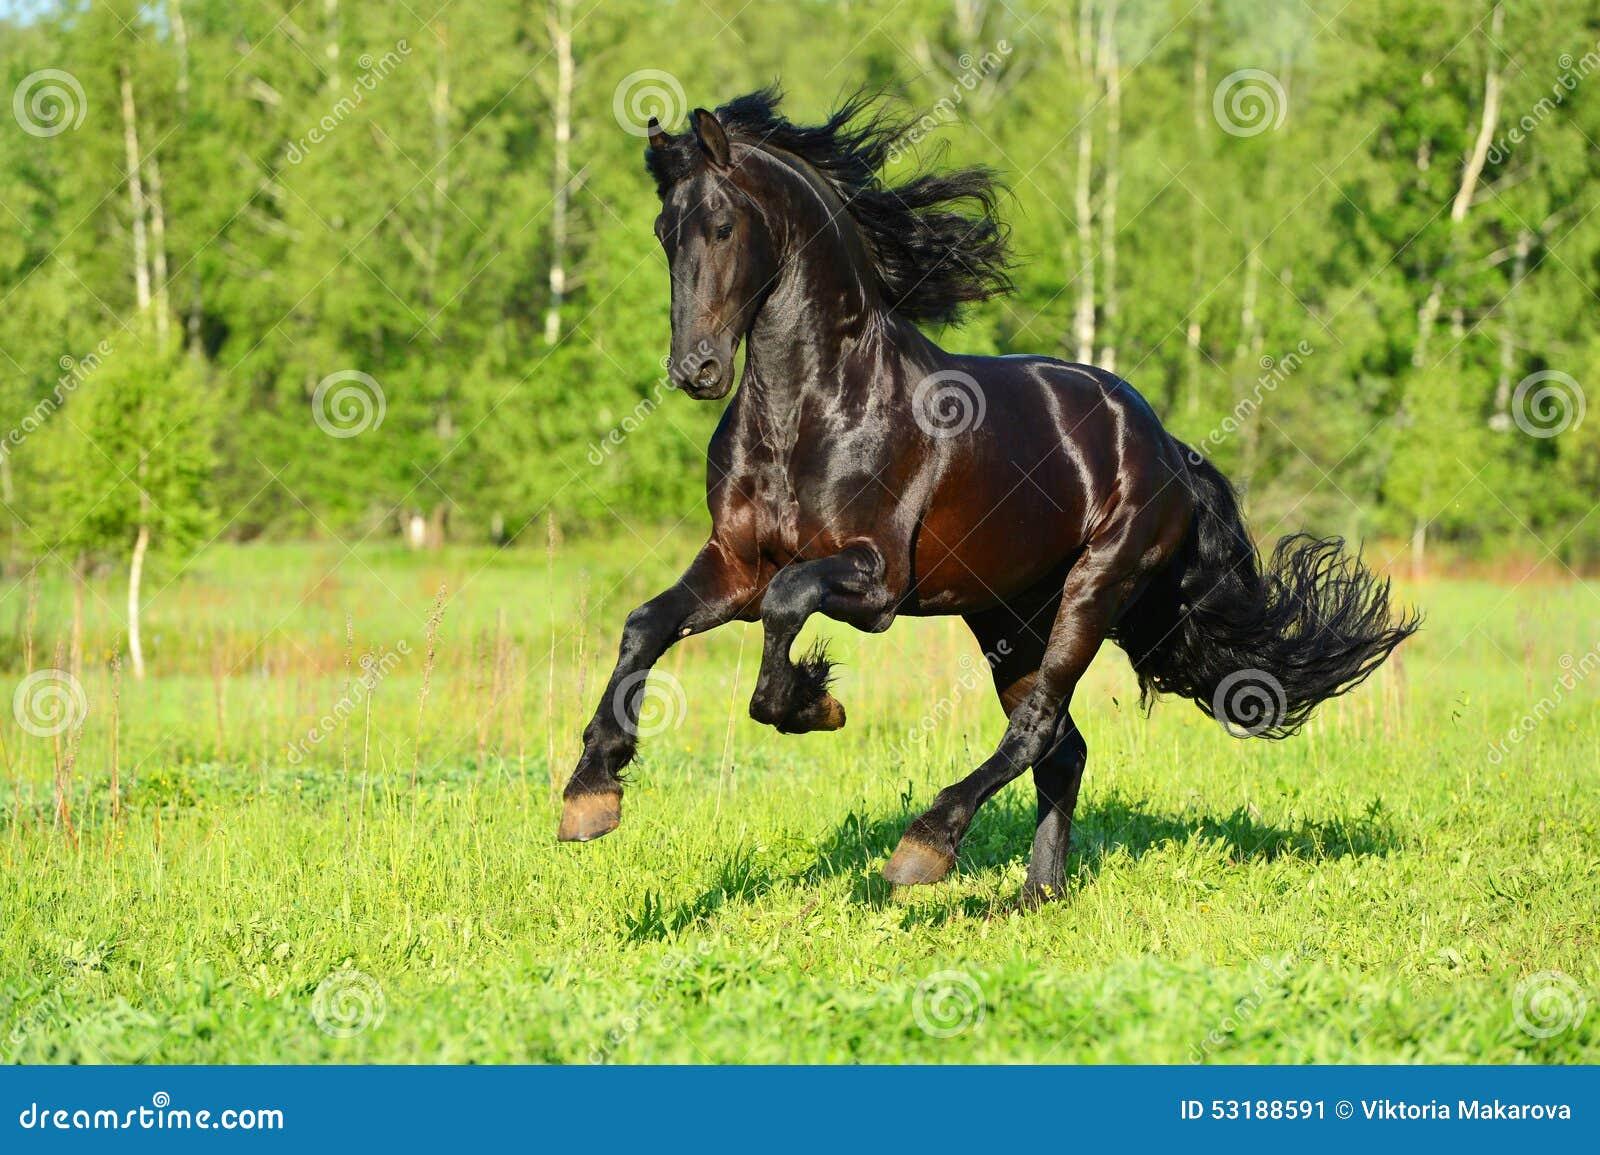 Black Friesian horse runs gallop in freedom